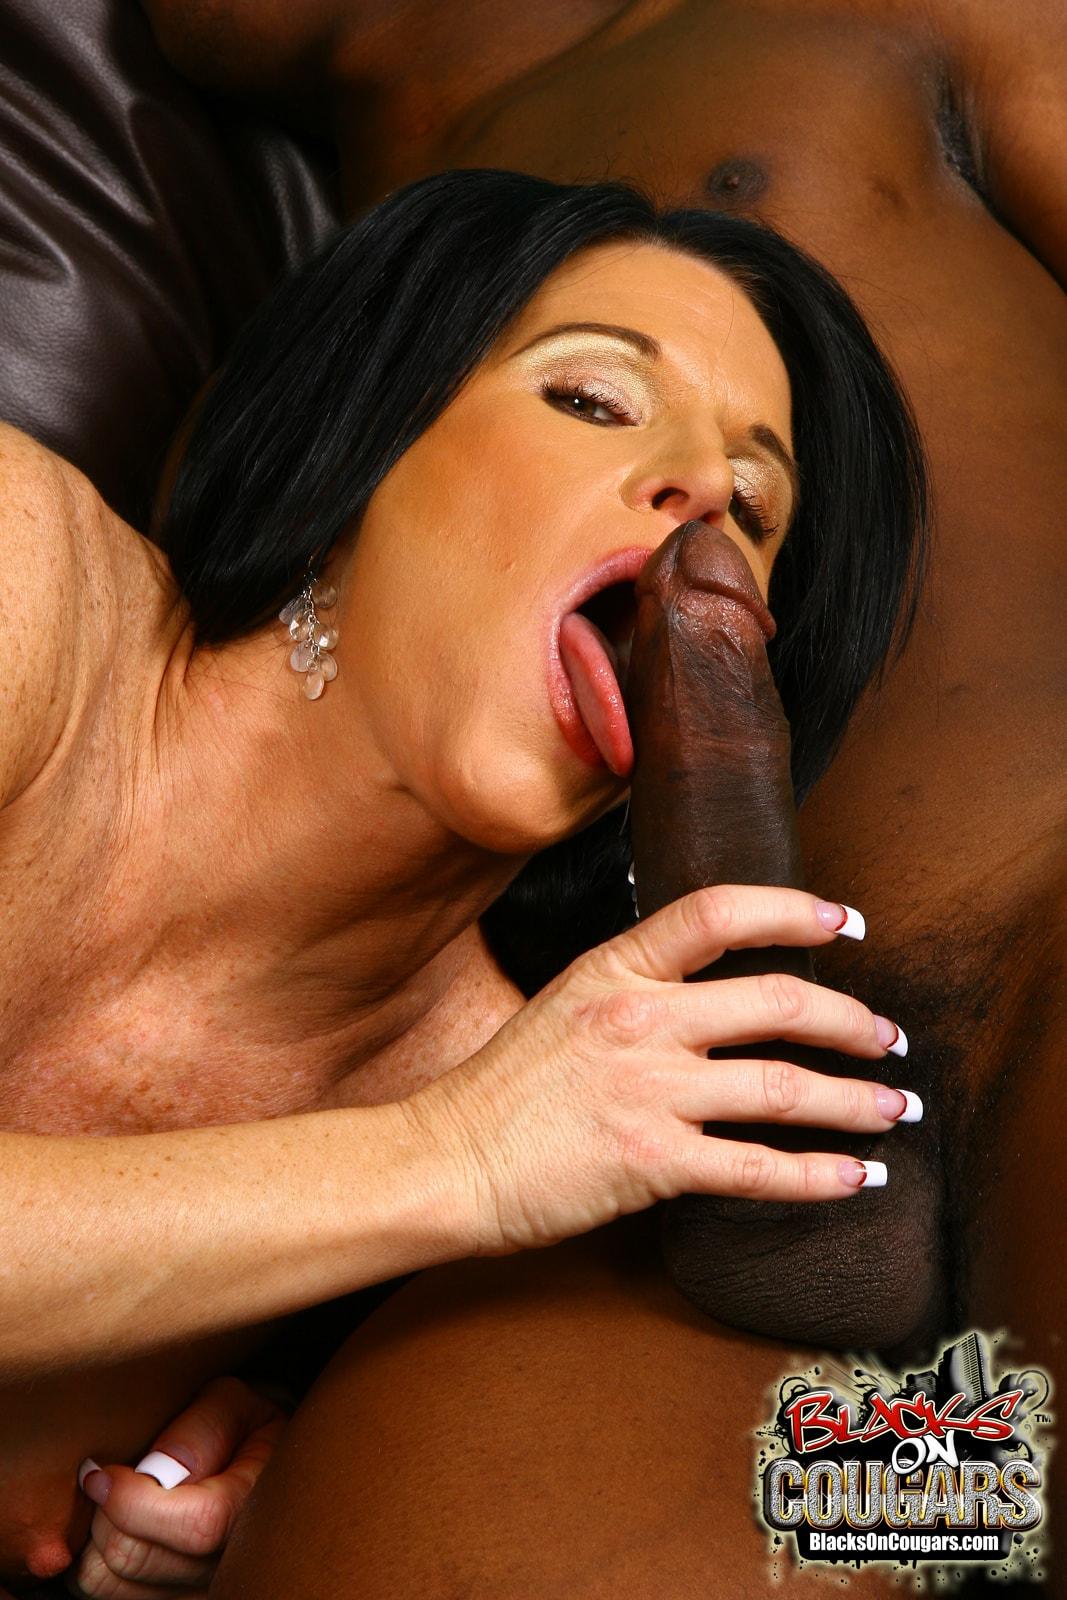 Dogfart '- Blacks On Cougars' starring Kendra Secrets (Photo 20)